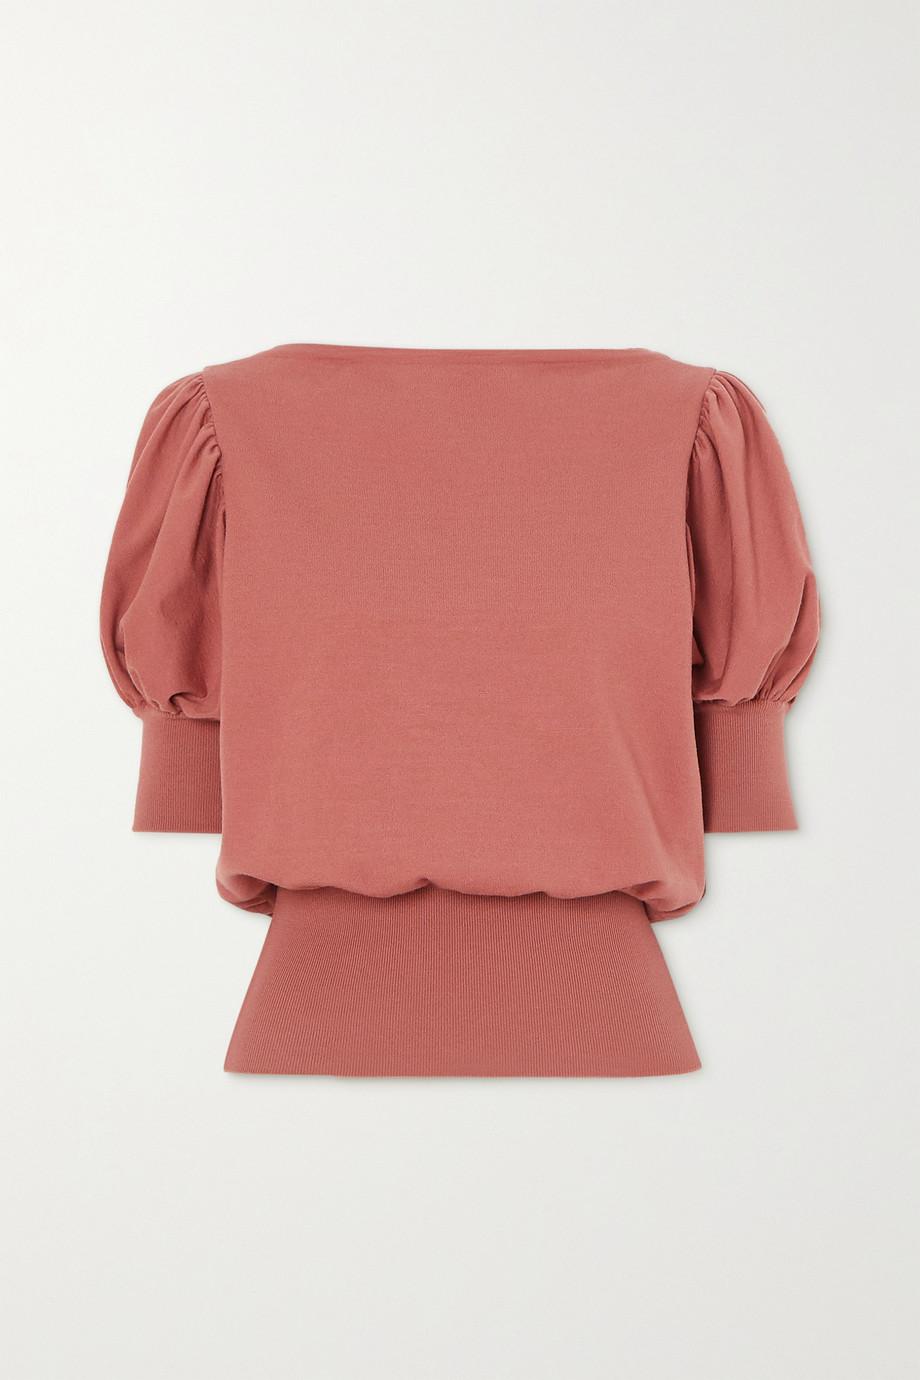 Alaïa Wool-blend top